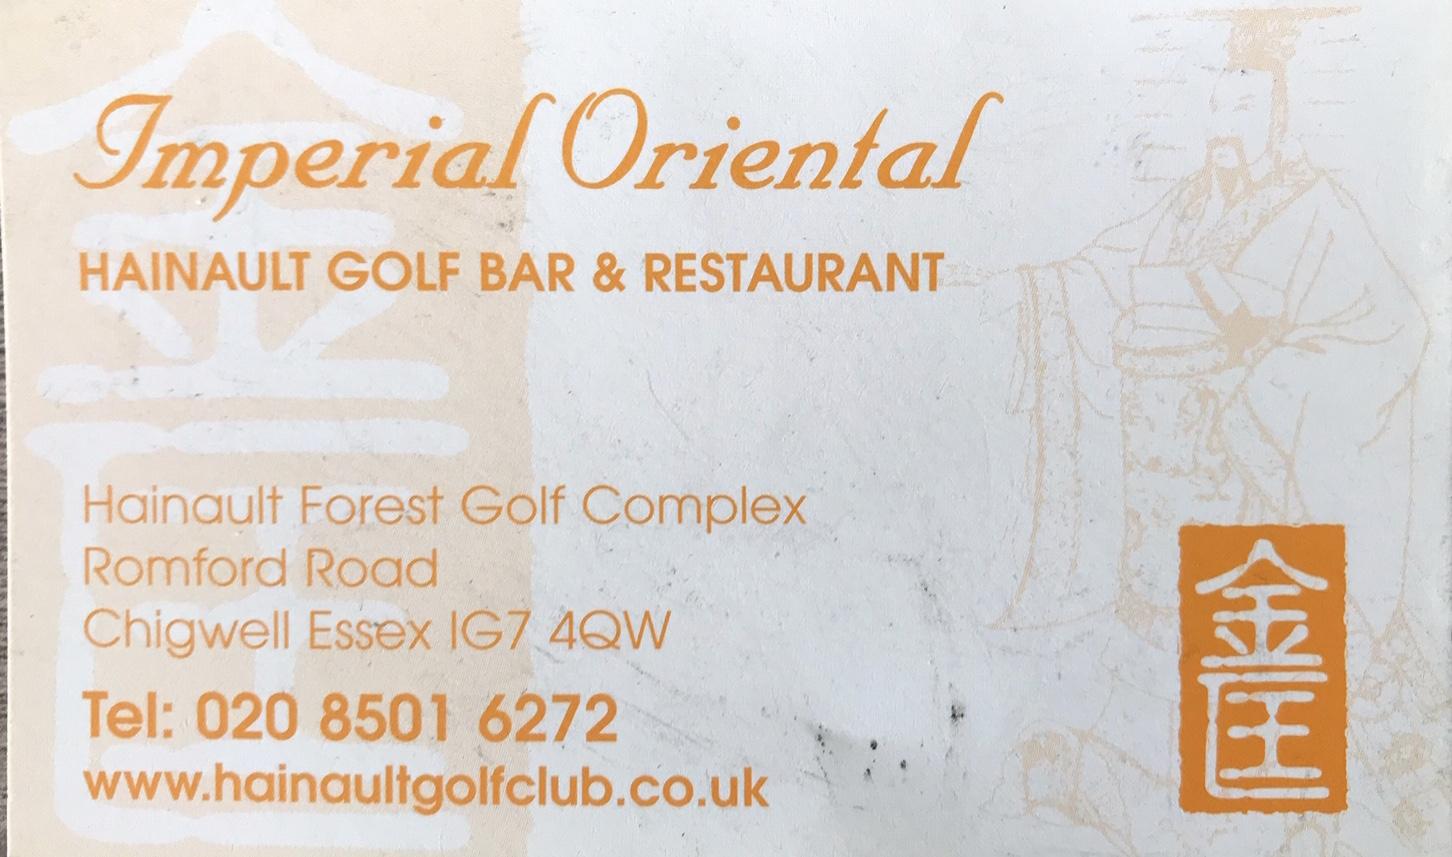 Imperial Oriental